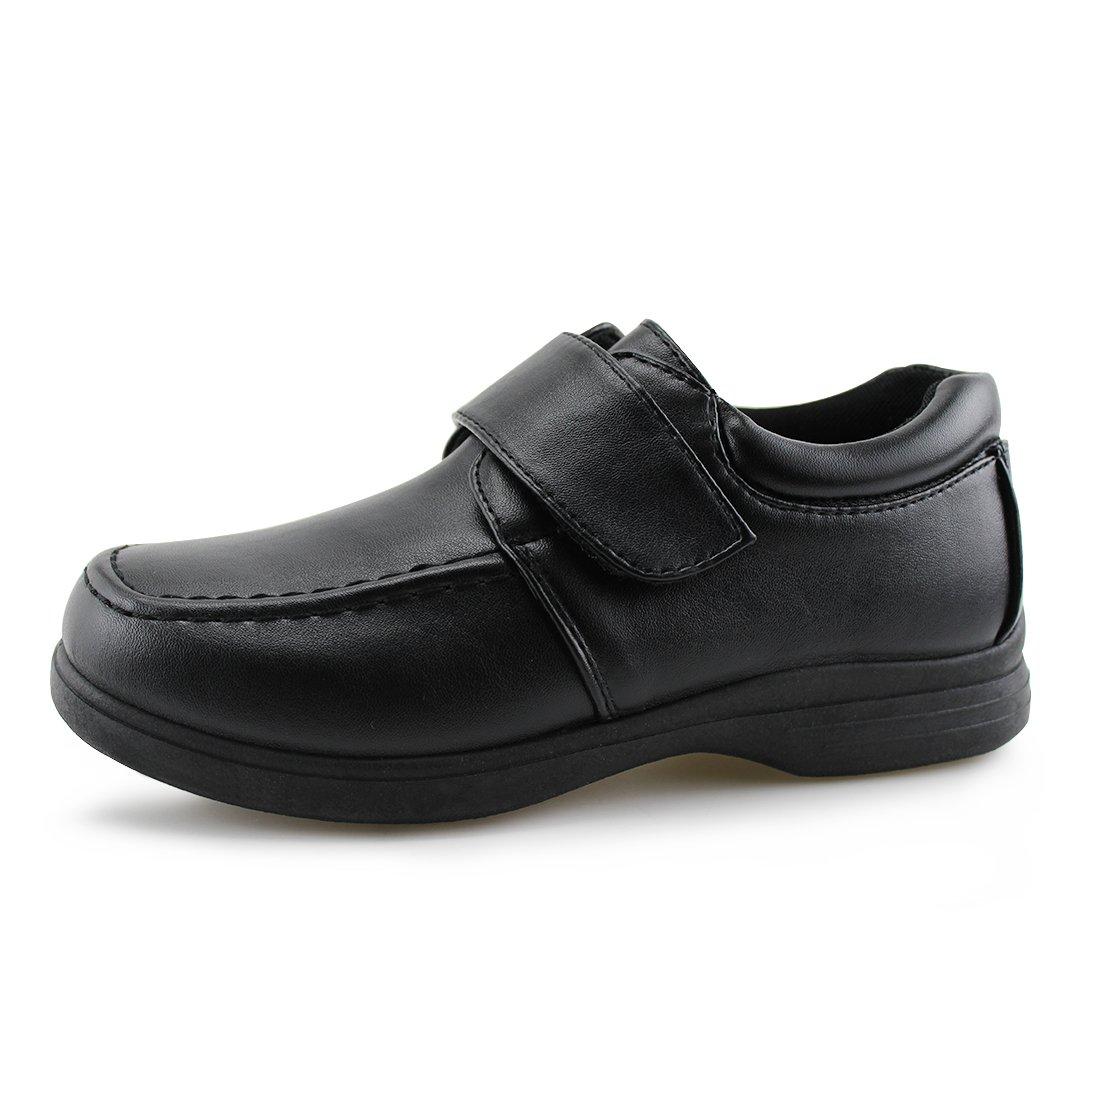 Hawkwell Kids School Uniform Dress Shoe(Toddler/Little Kid),Black PU,13 M US